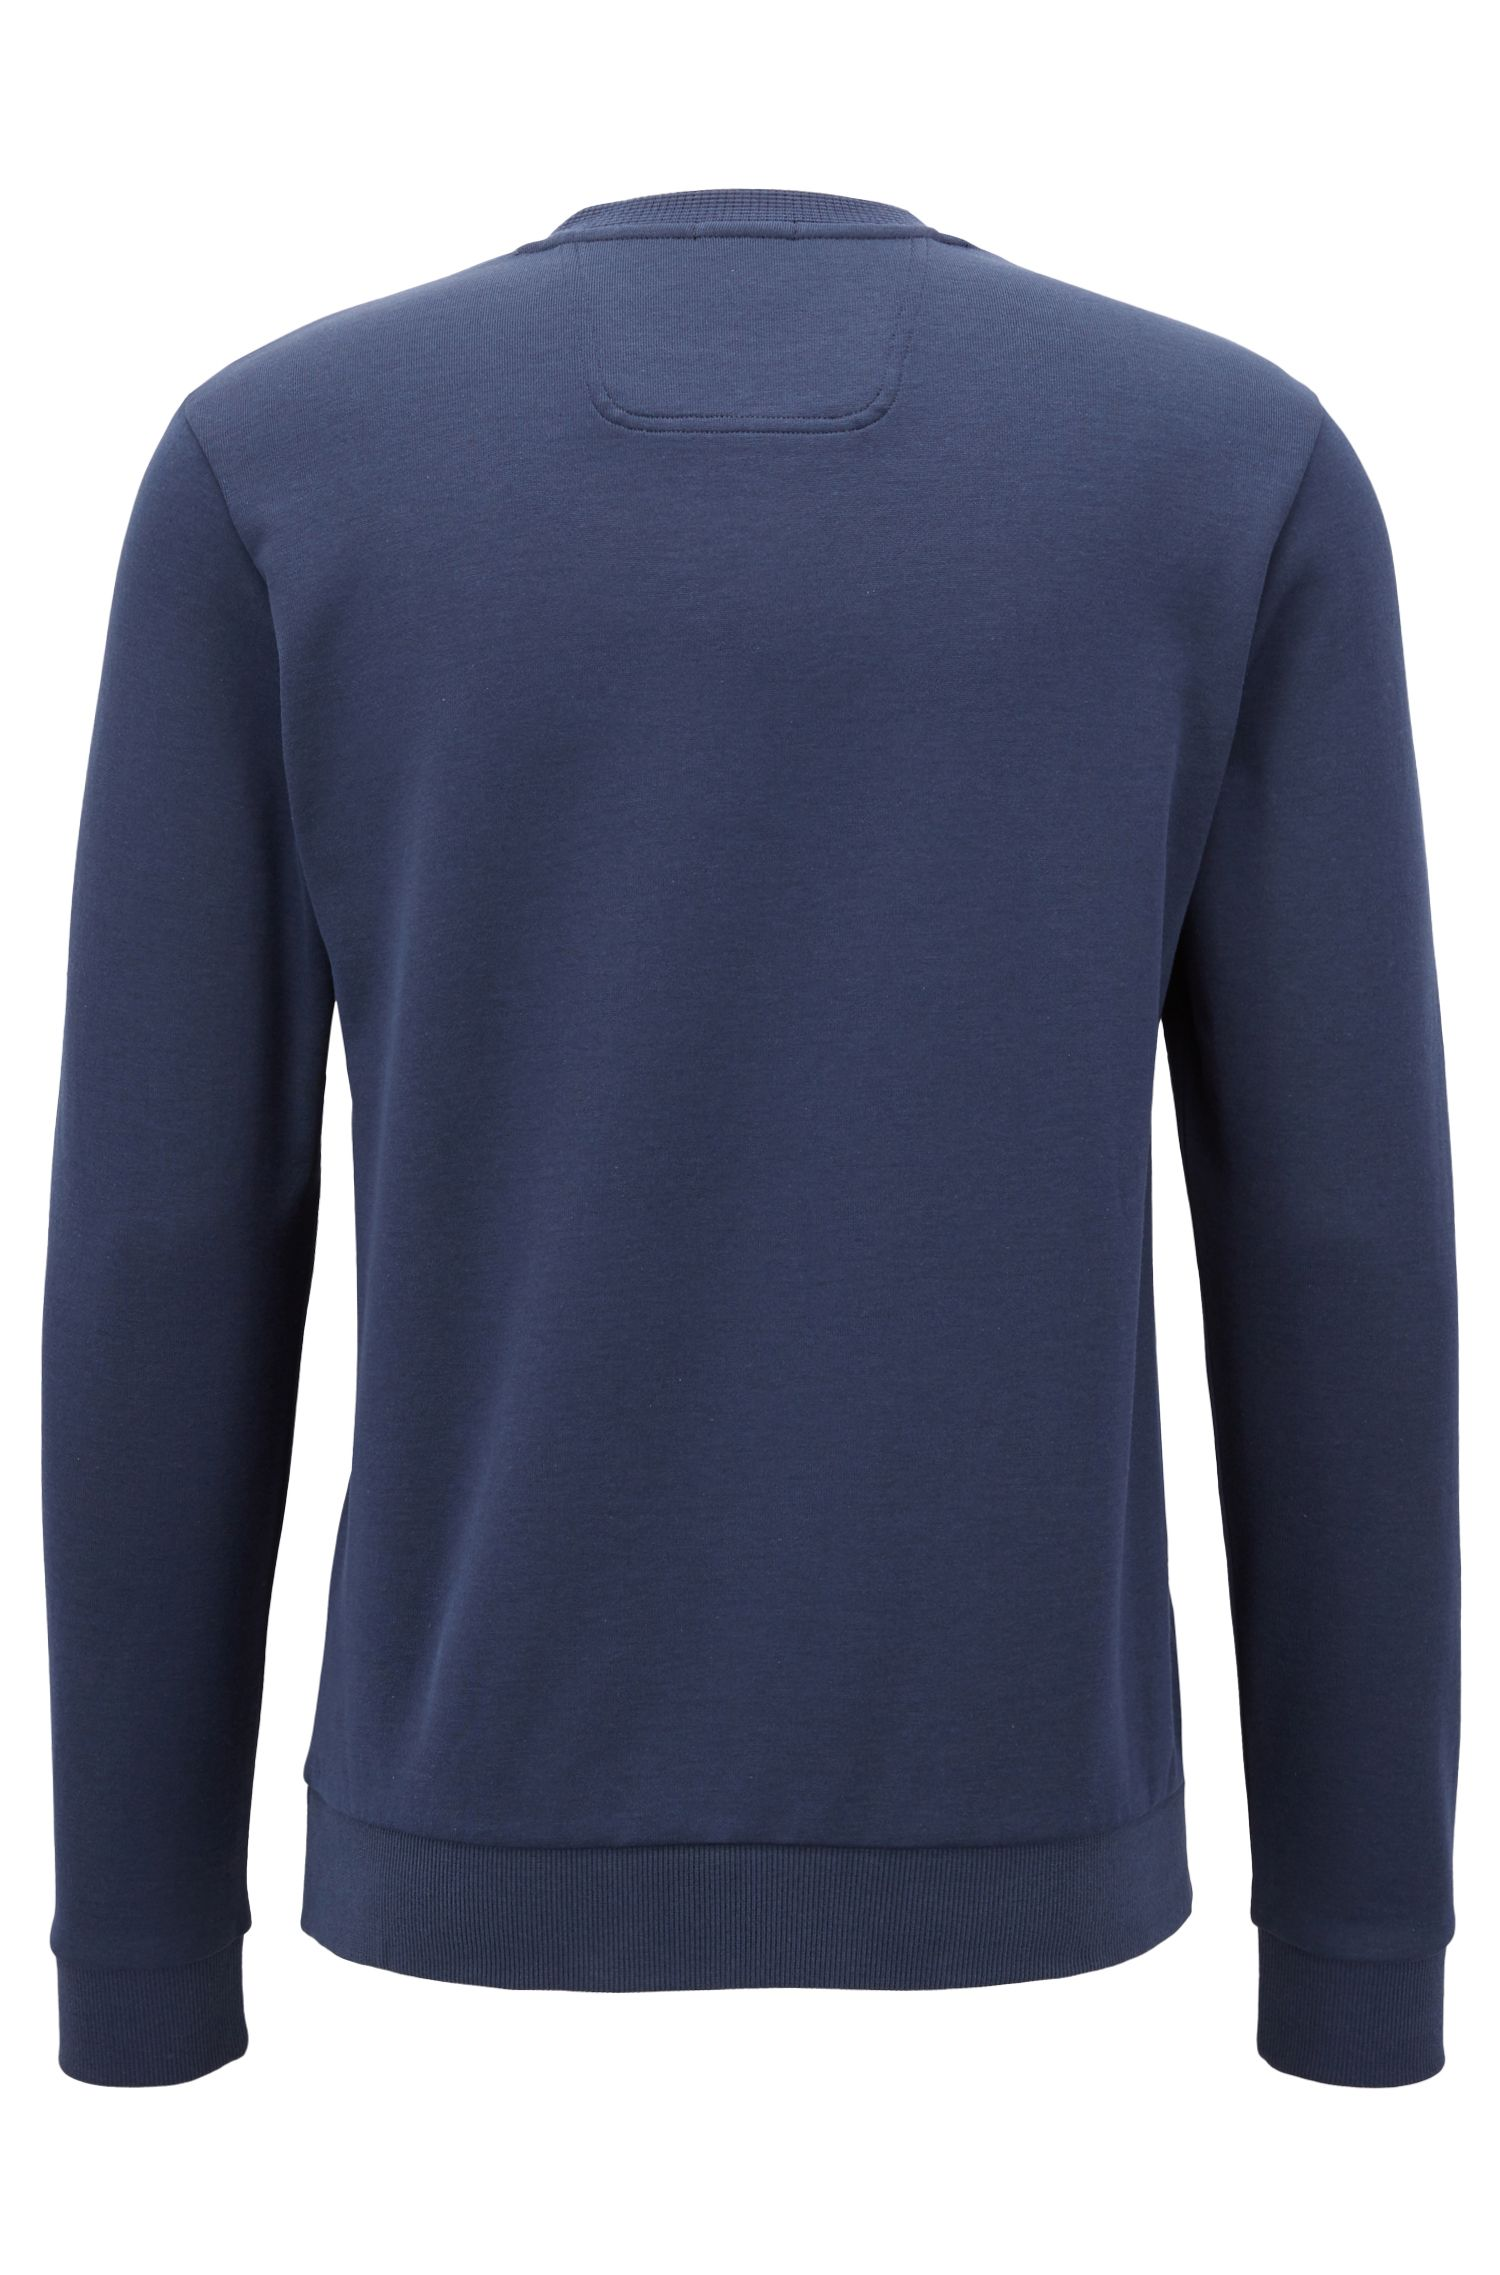 Sudadera de cuello redondo en mezcla de algodón, Azul oscuro